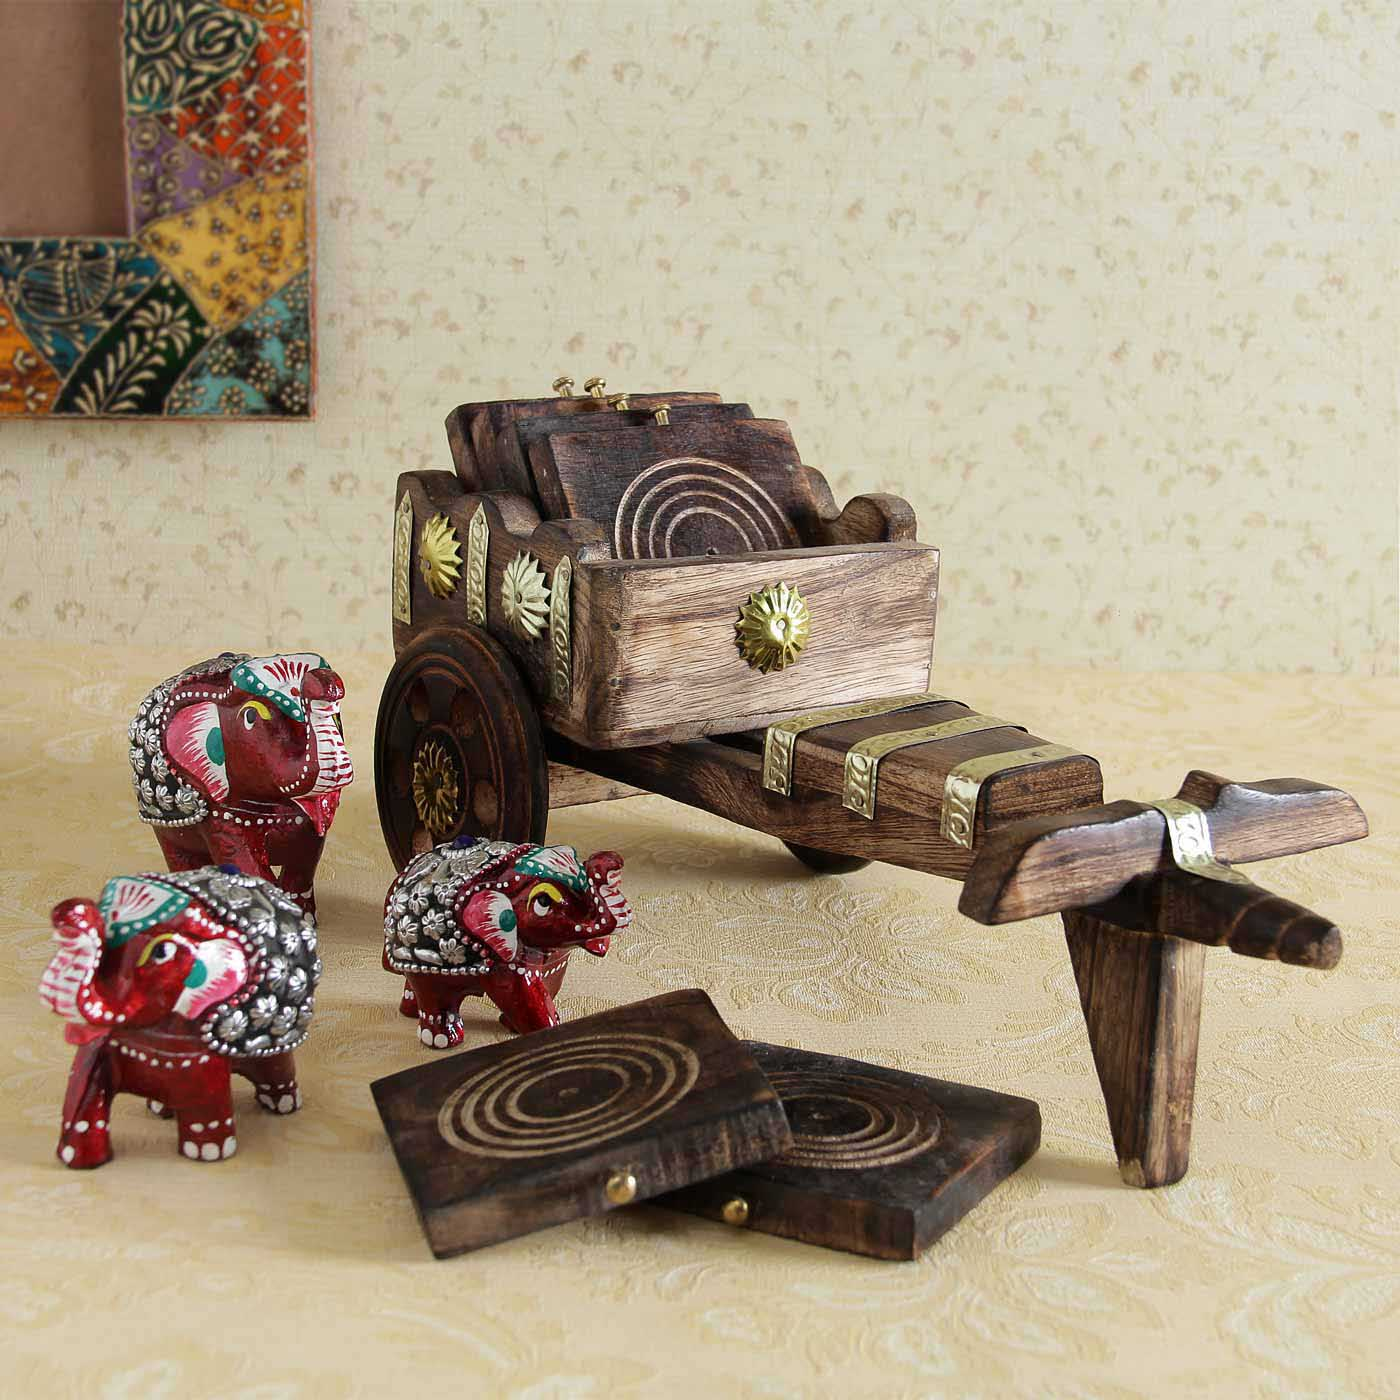 Epic Wooden Coasters and Elephant Showpiece Set